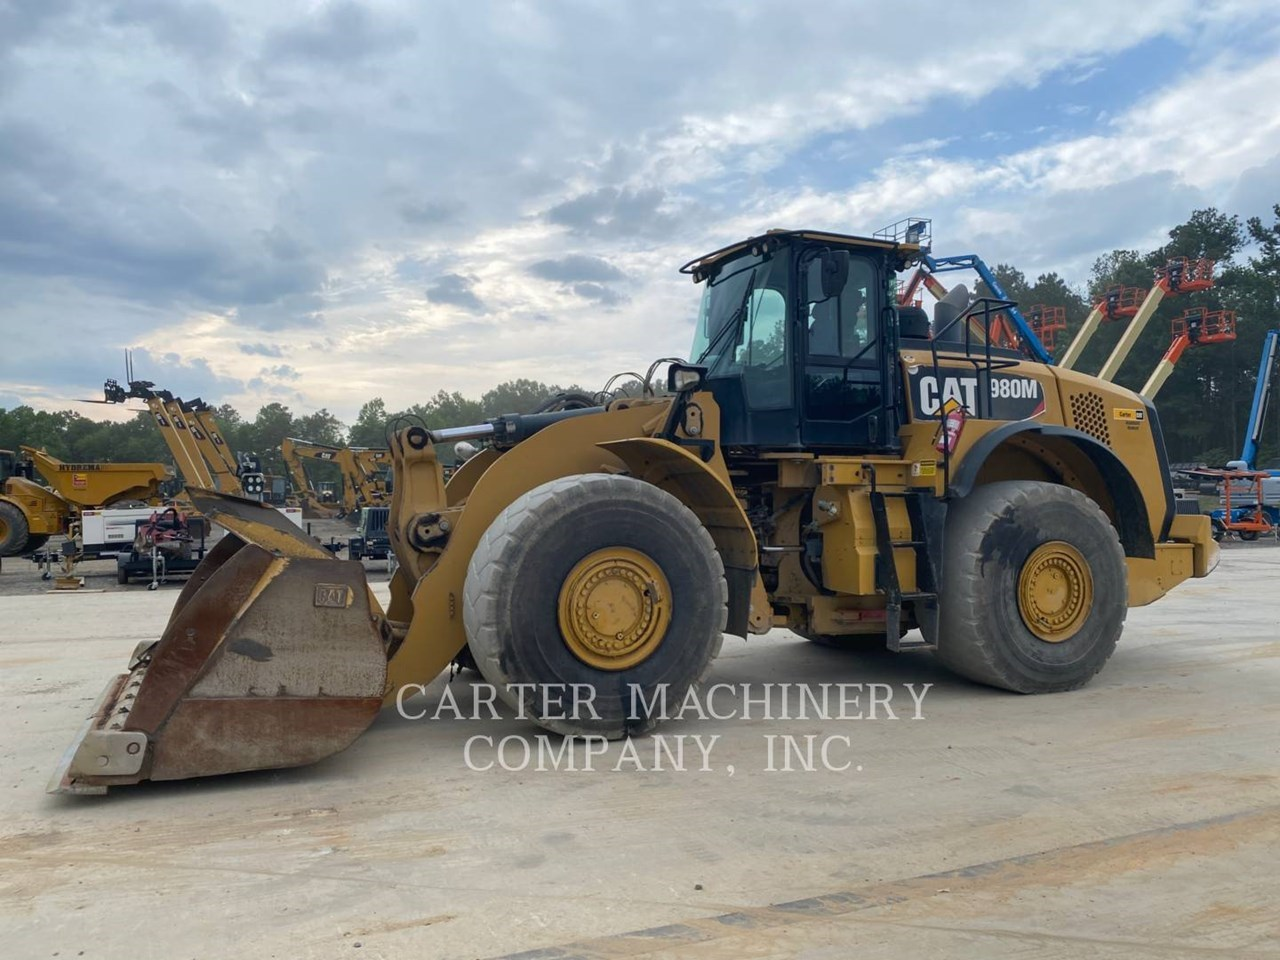 2016 Caterpillar 980M Image 1